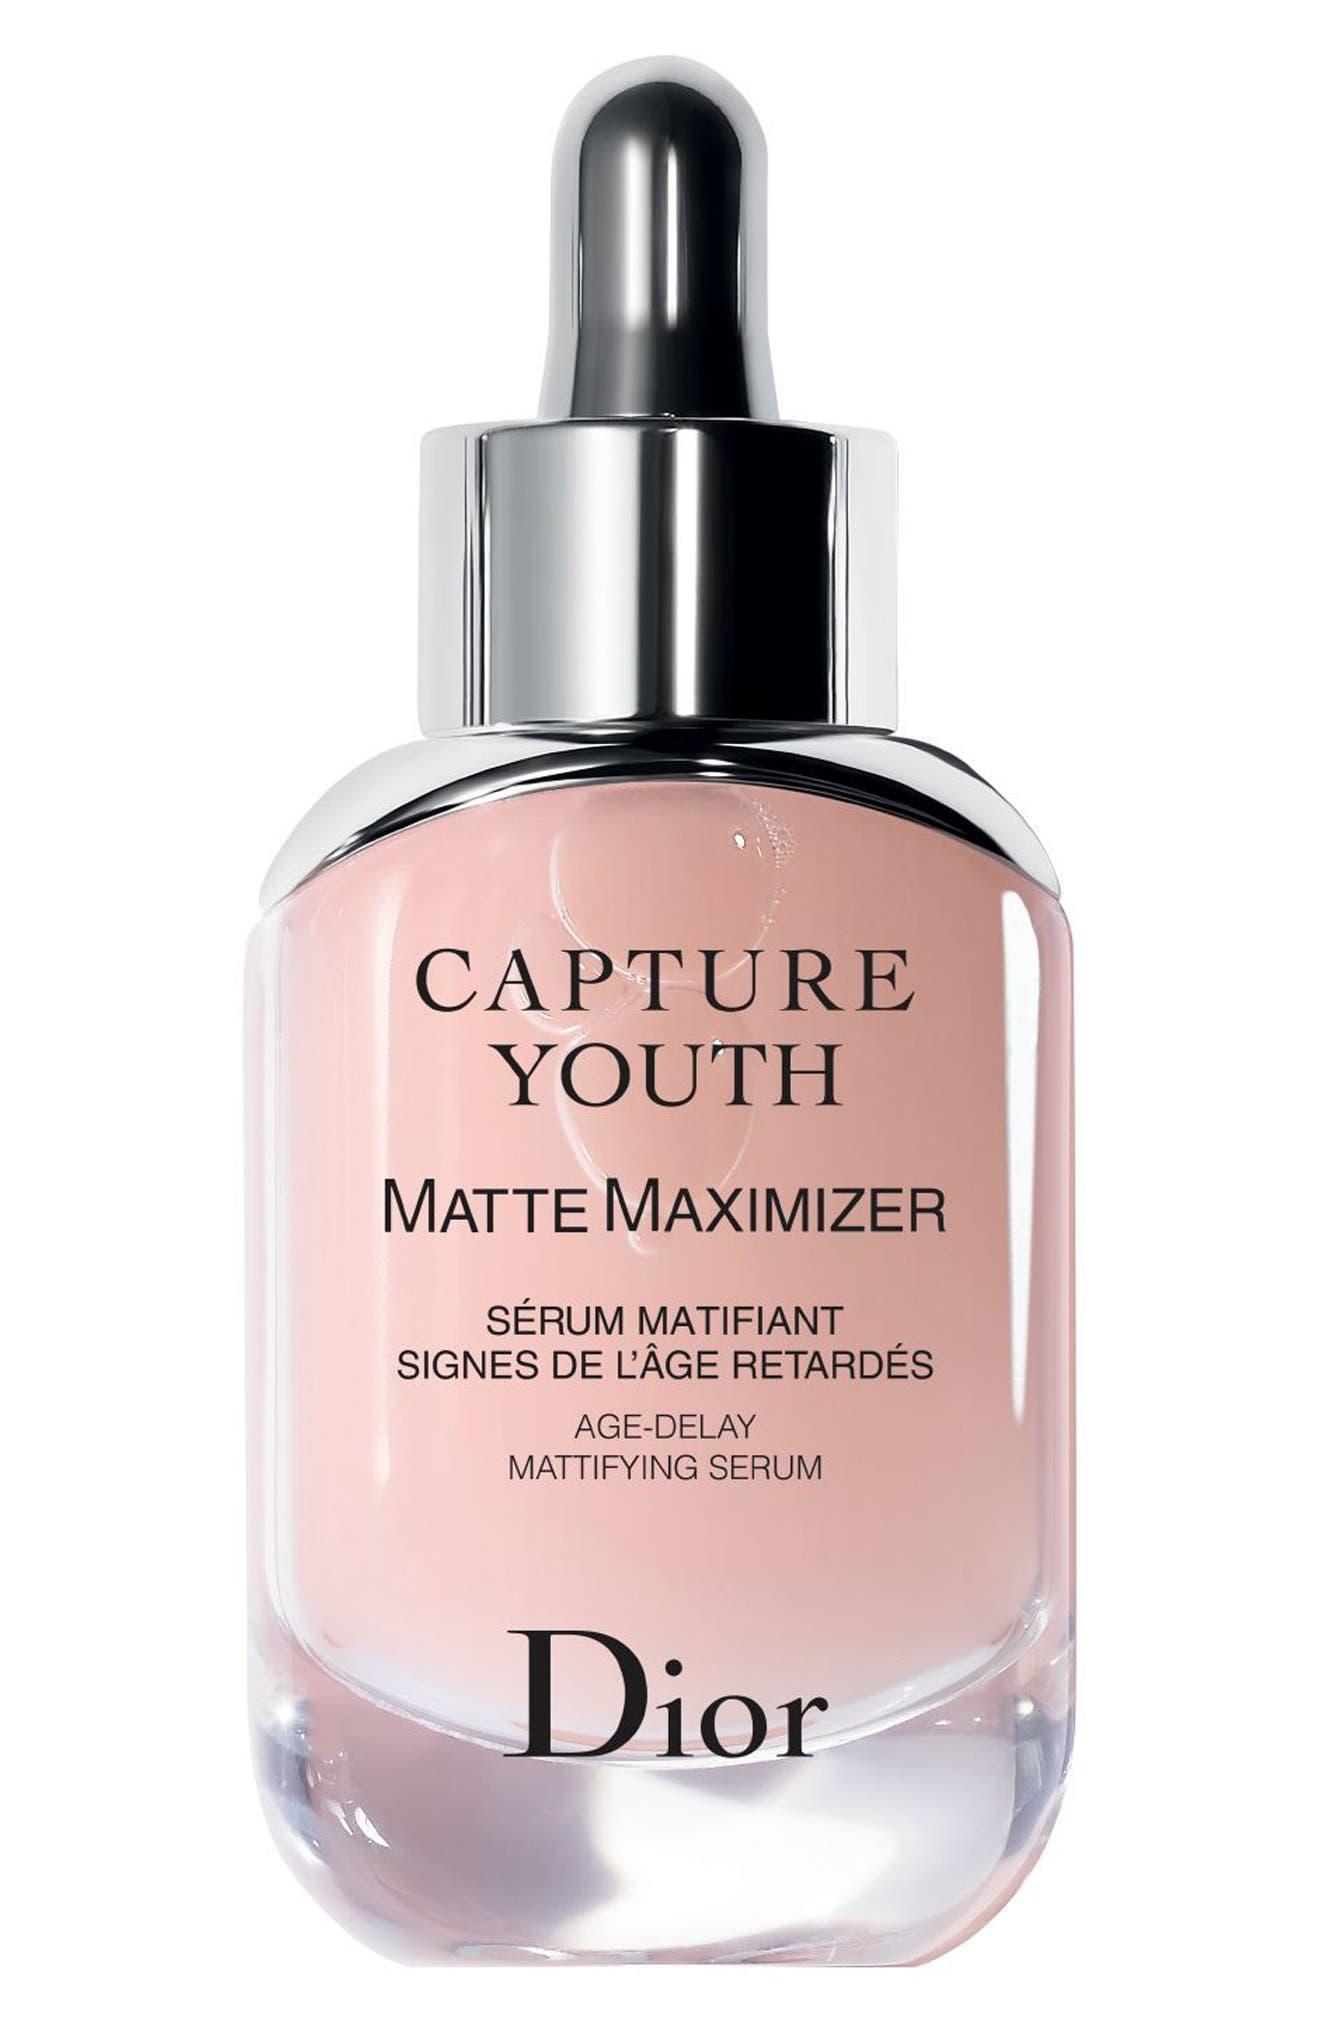 Capture Youth Matte Maximizer Age-Delay Mattifying Serum,                             Main thumbnail 1, color,                             No Color